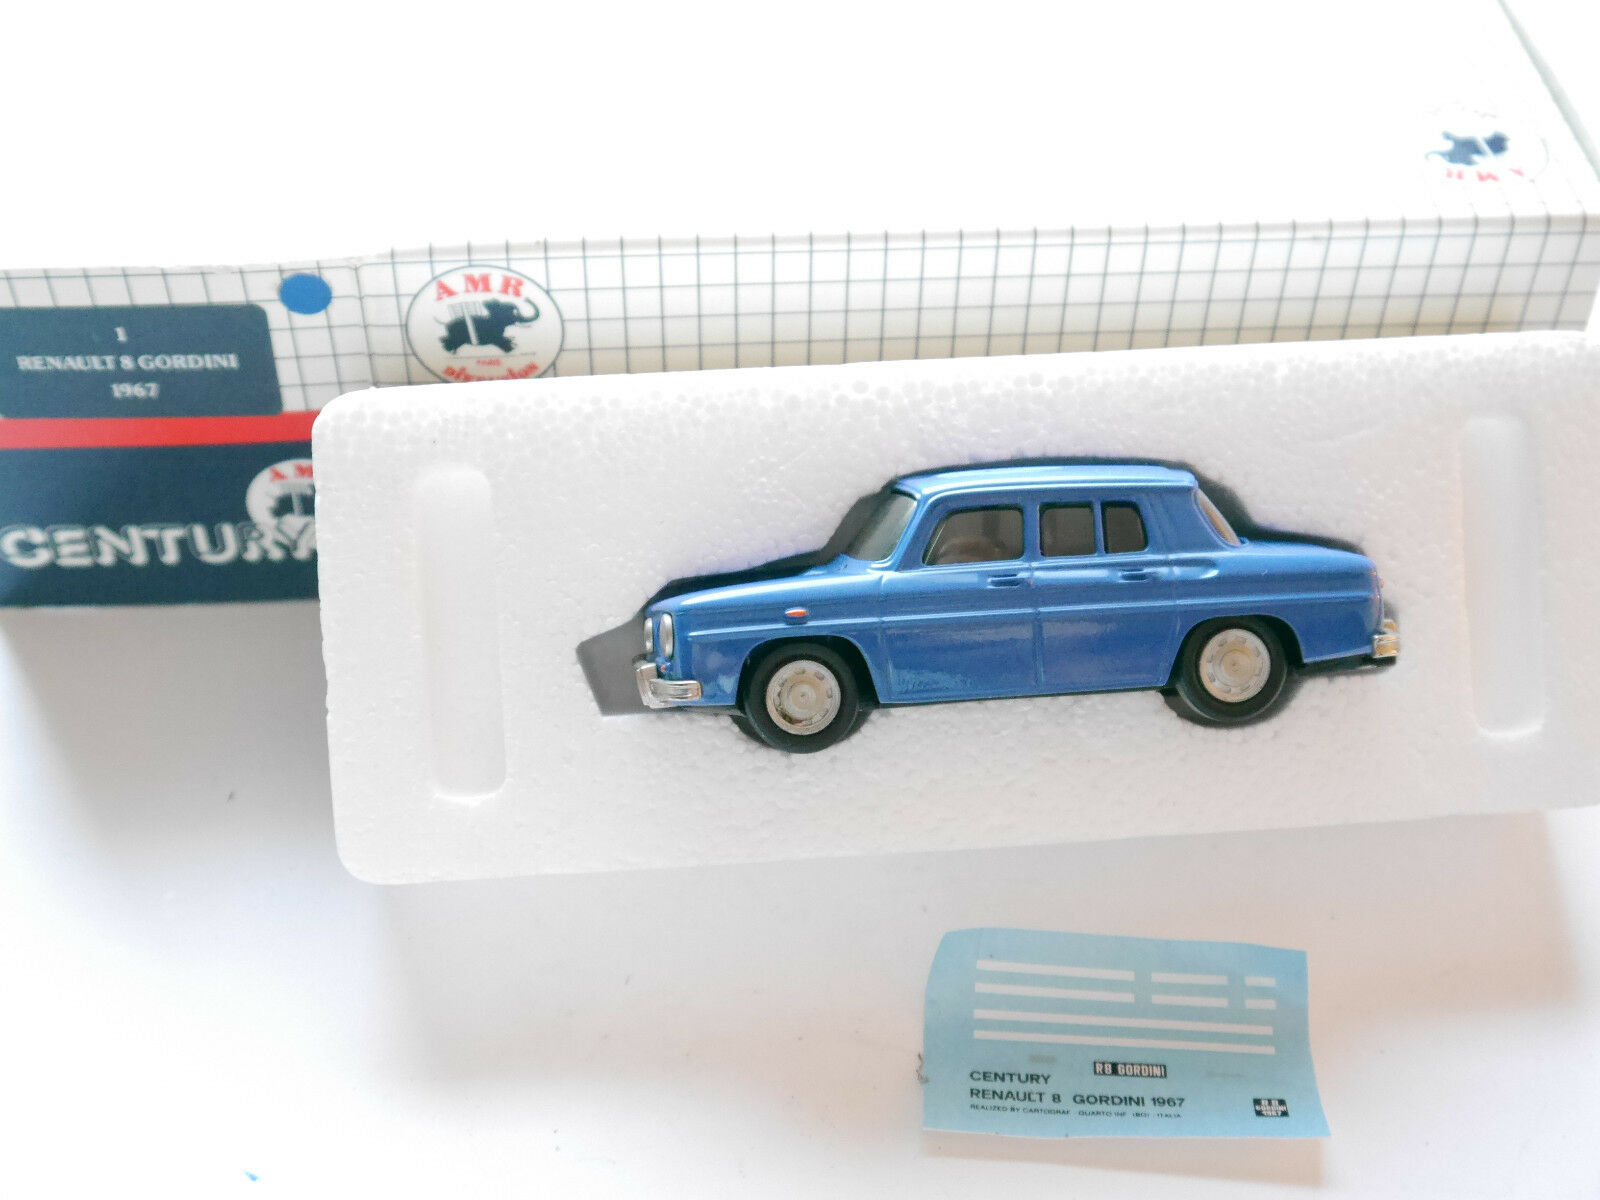 RENAULT R 8 r8 Gordini 1967 in Bleu Bleu bleu bleu, Century en 1 43 en boîte